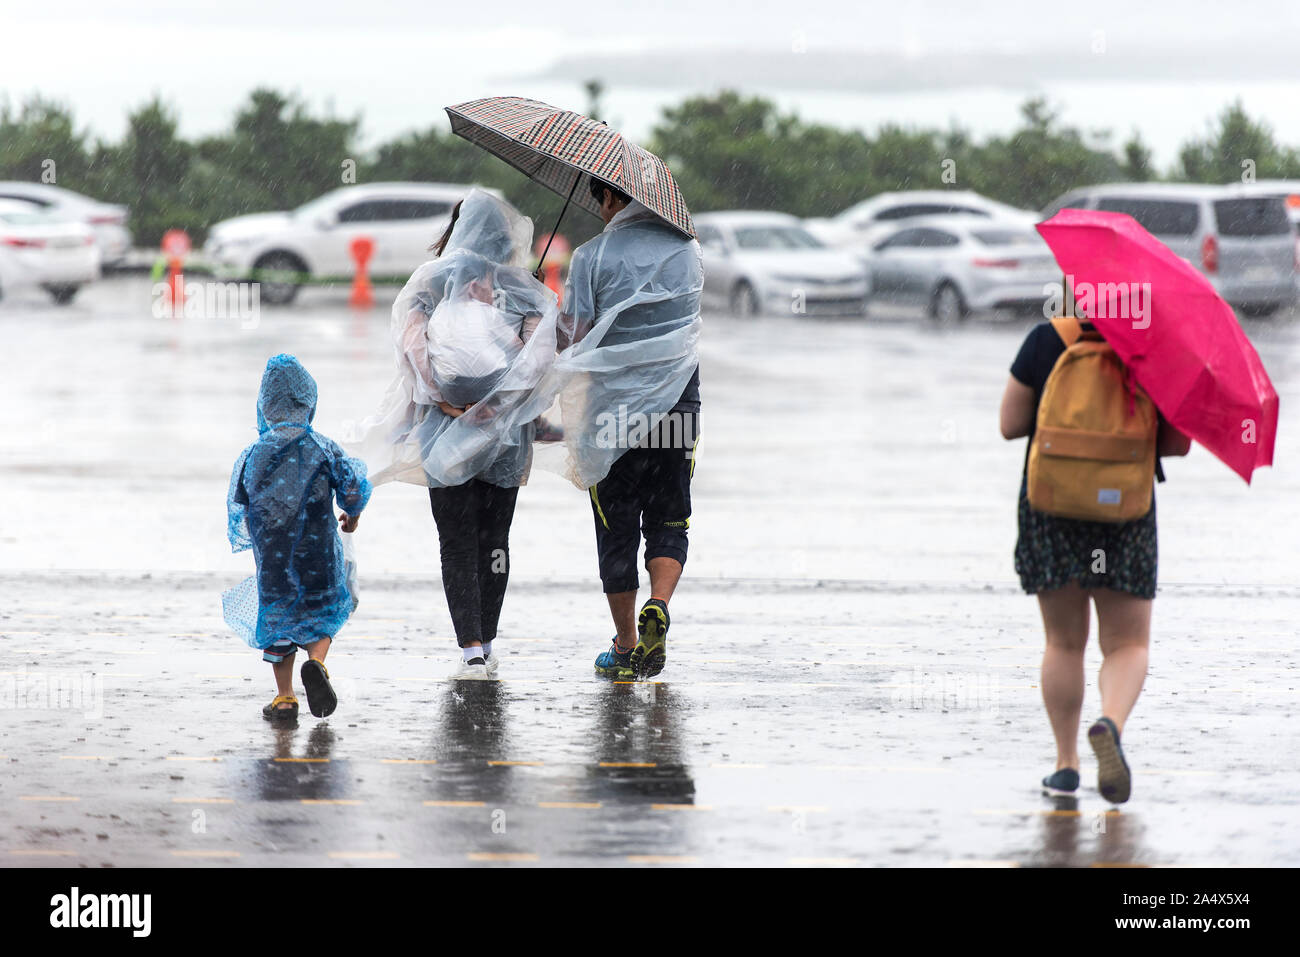 JEJU - SEPT 28: JEJU - SEPT 28: Typhoon. Cold and windy day in Jeju Island on September 28. 2016 in South Korea Stock Photo